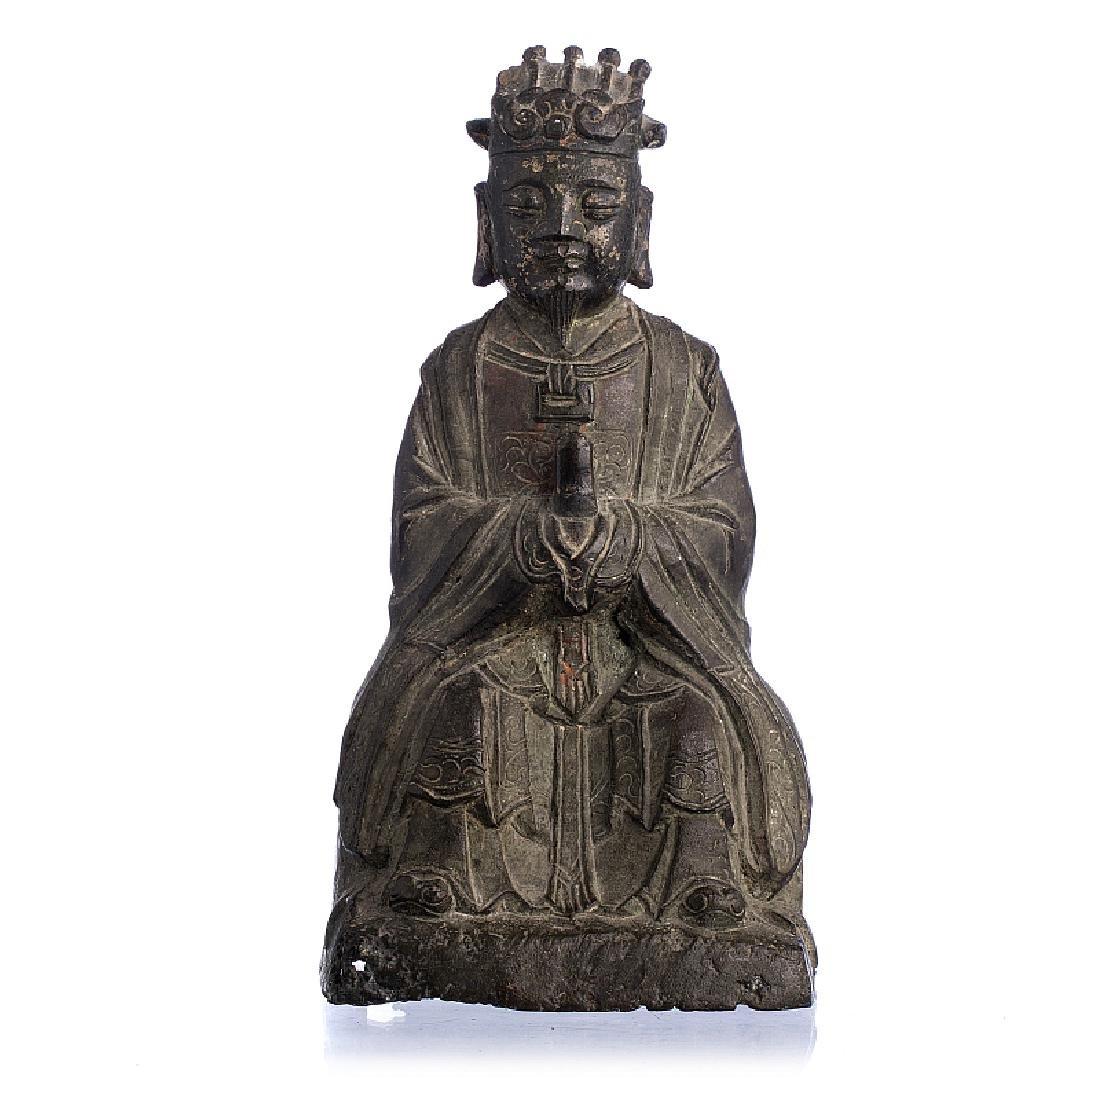 Dignitary figure in bronze